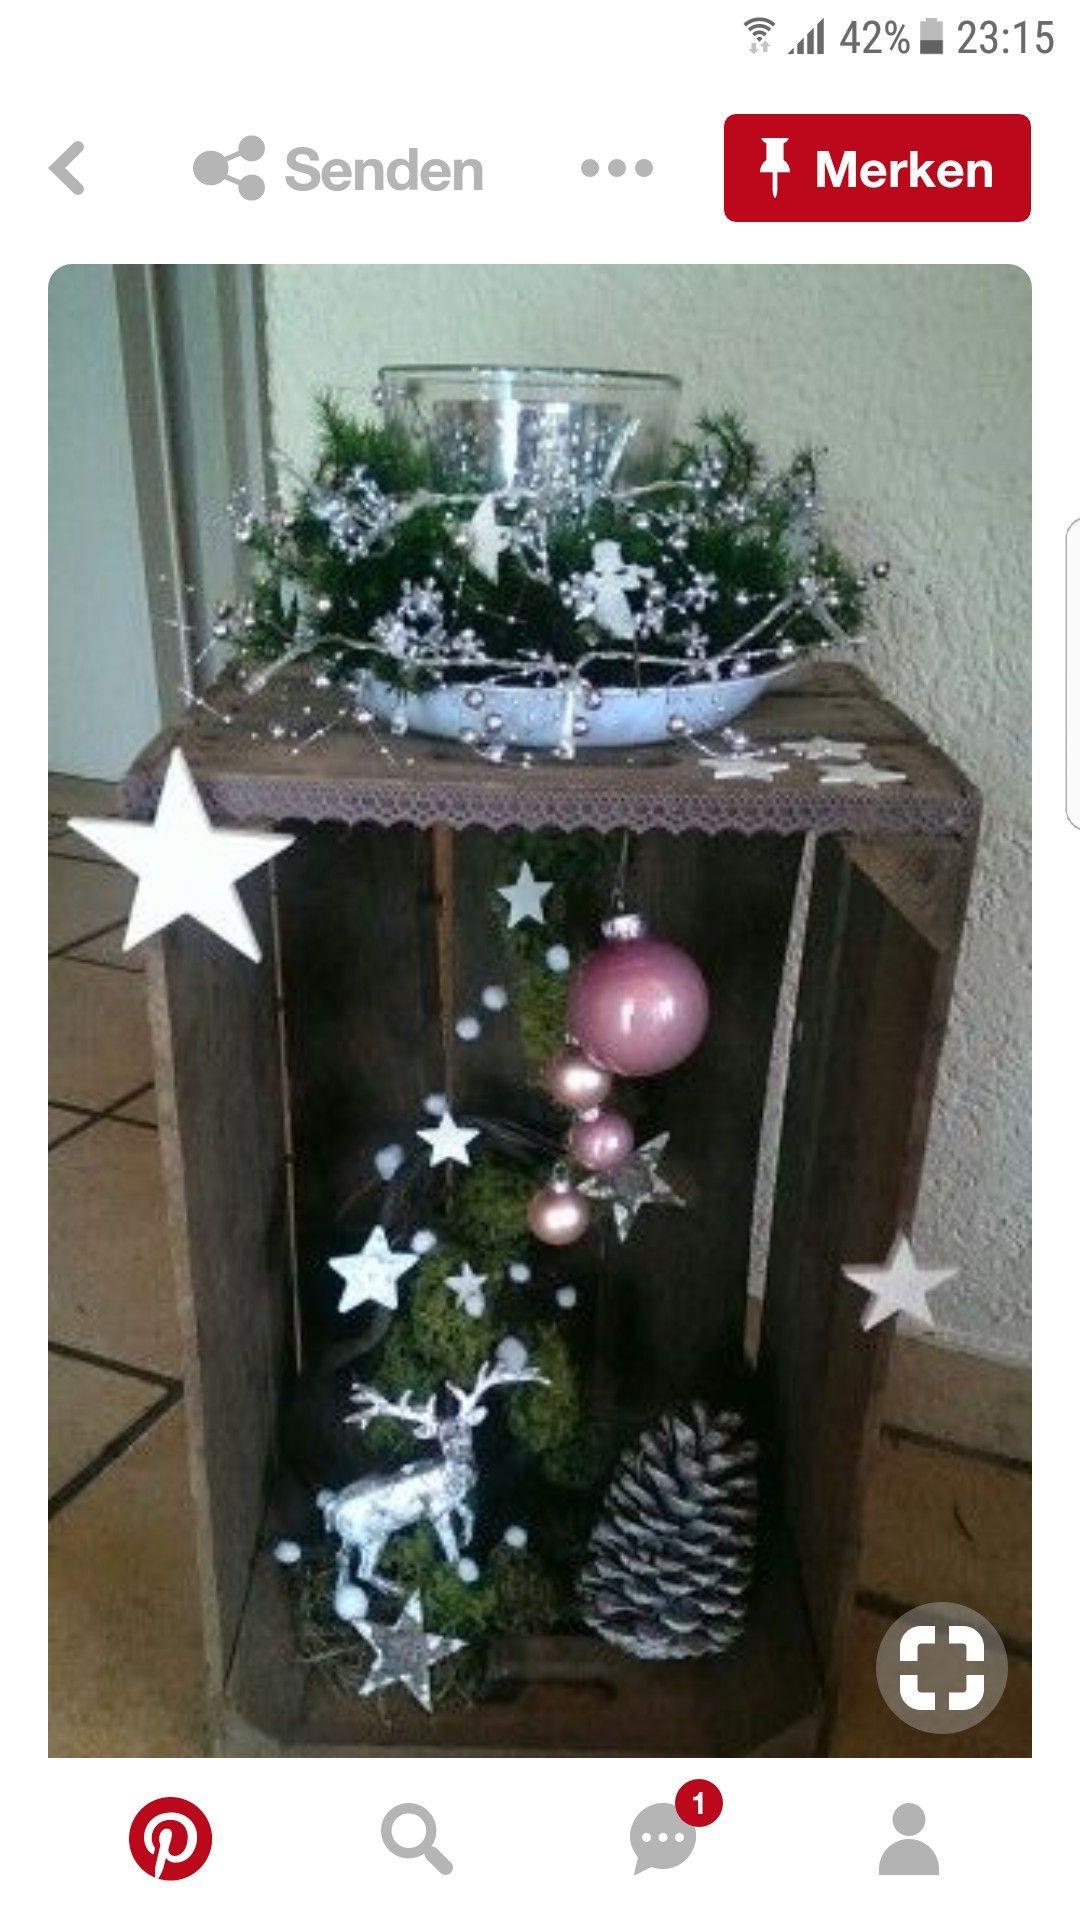 pin von spyroulla michael auf christmas. Black Bedroom Furniture Sets. Home Design Ideas